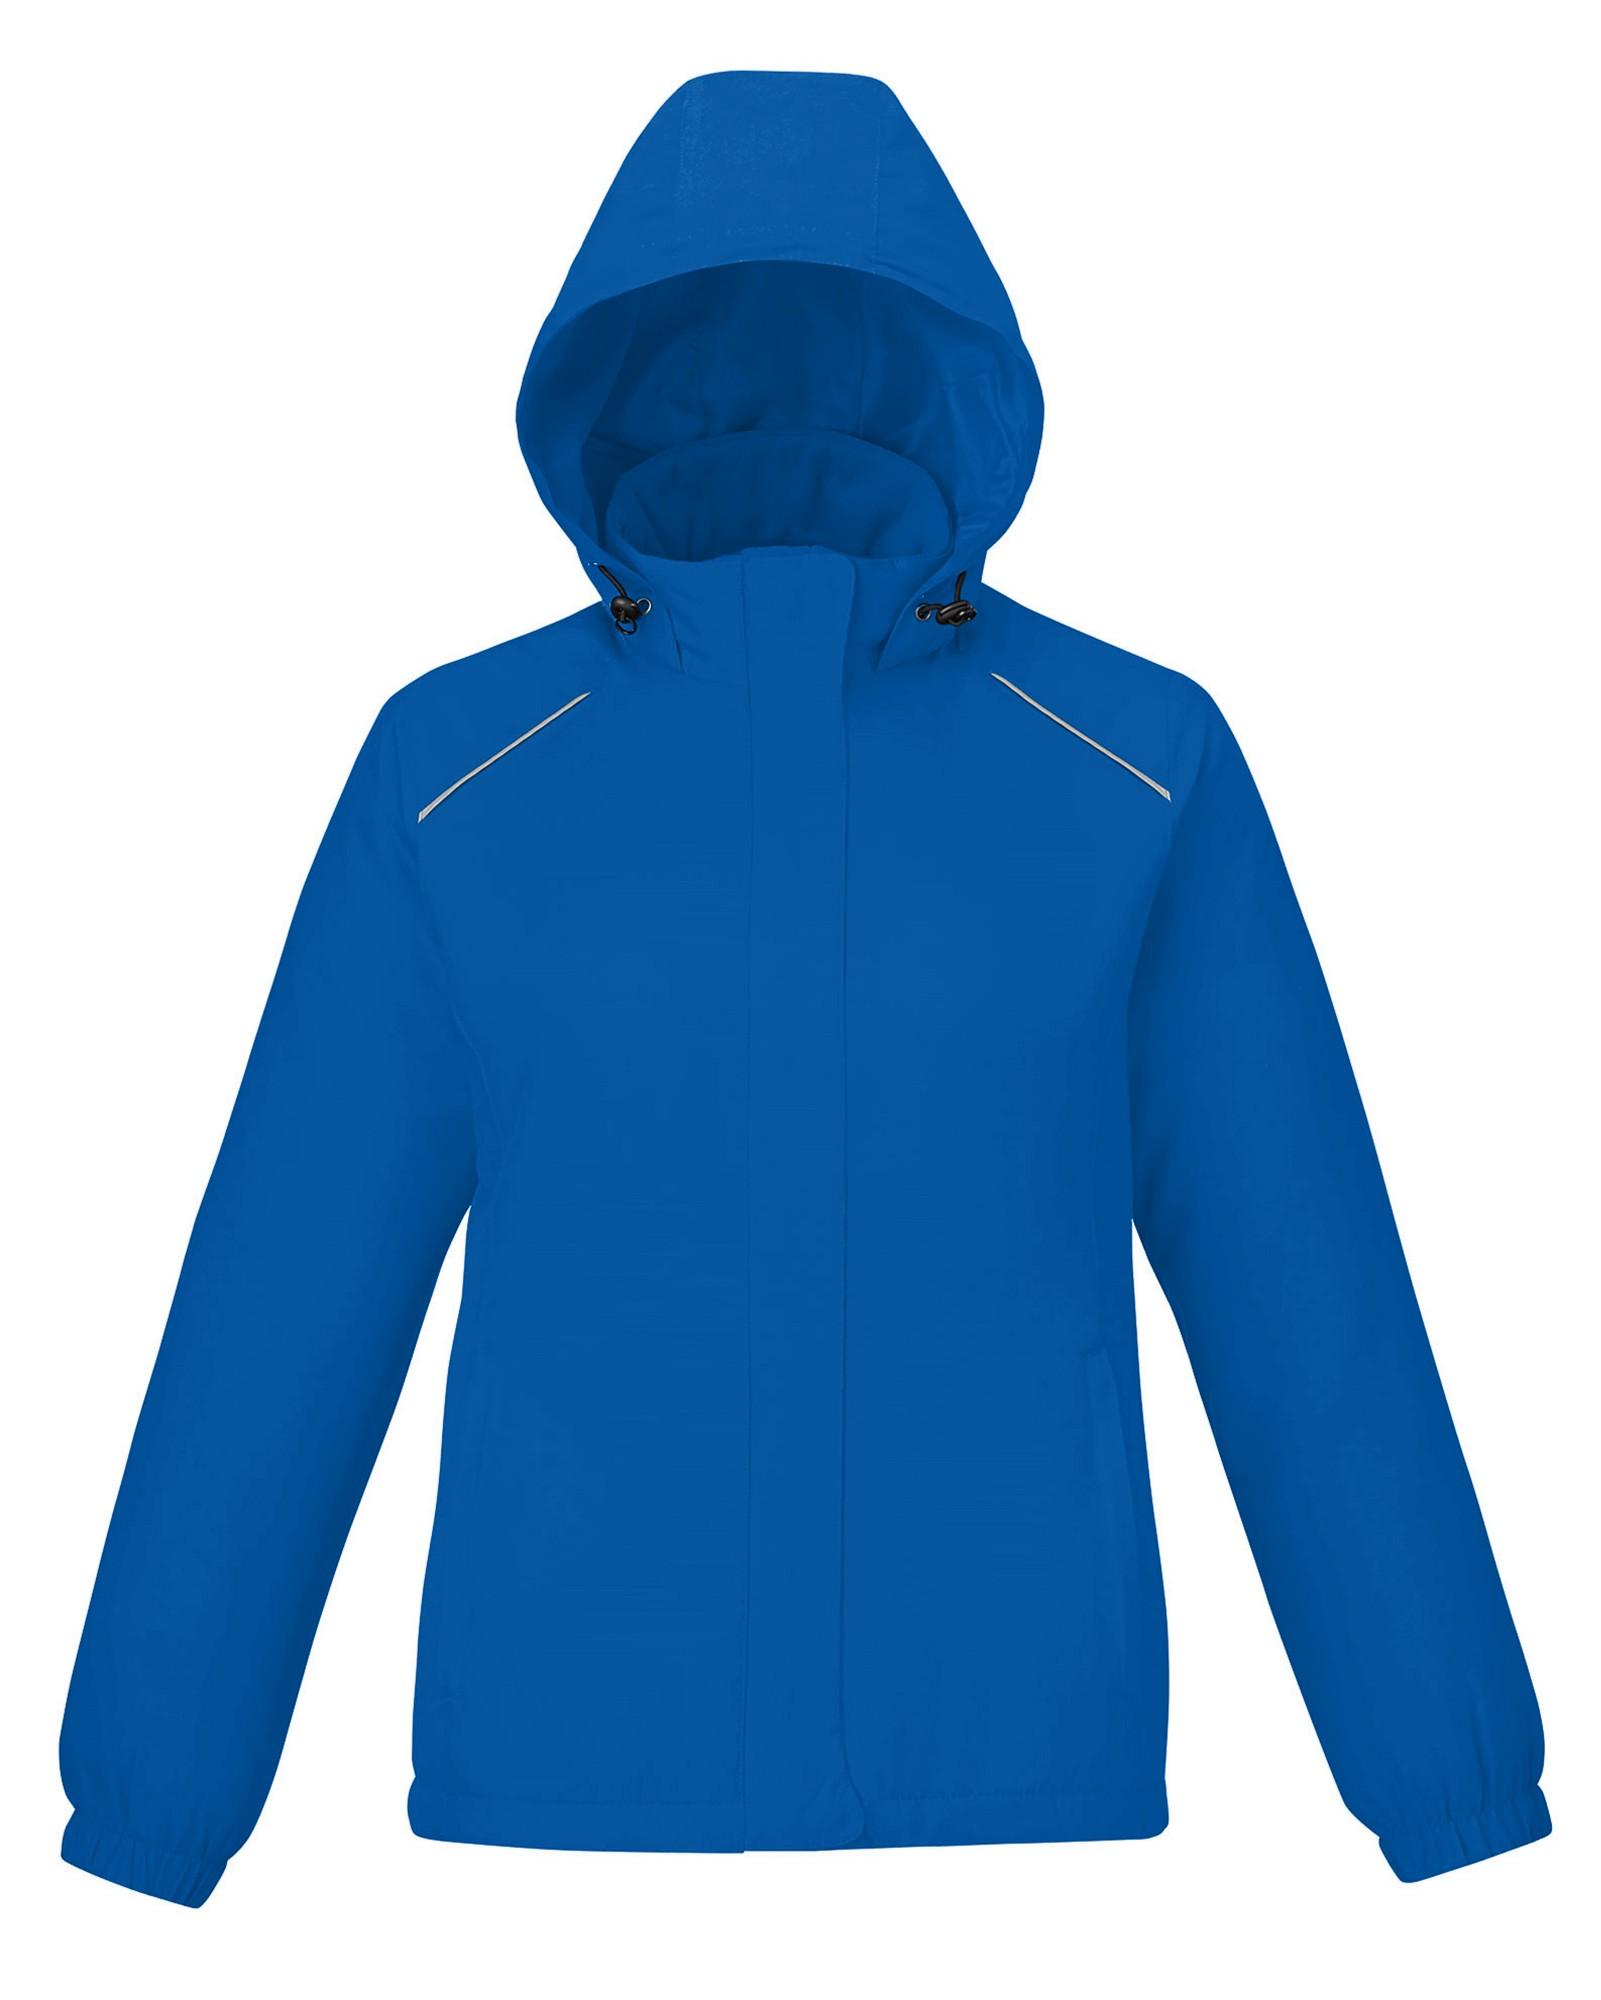 24e520a843a AMP_CA | Brisk Core365™ Ladies Insulated Jacket